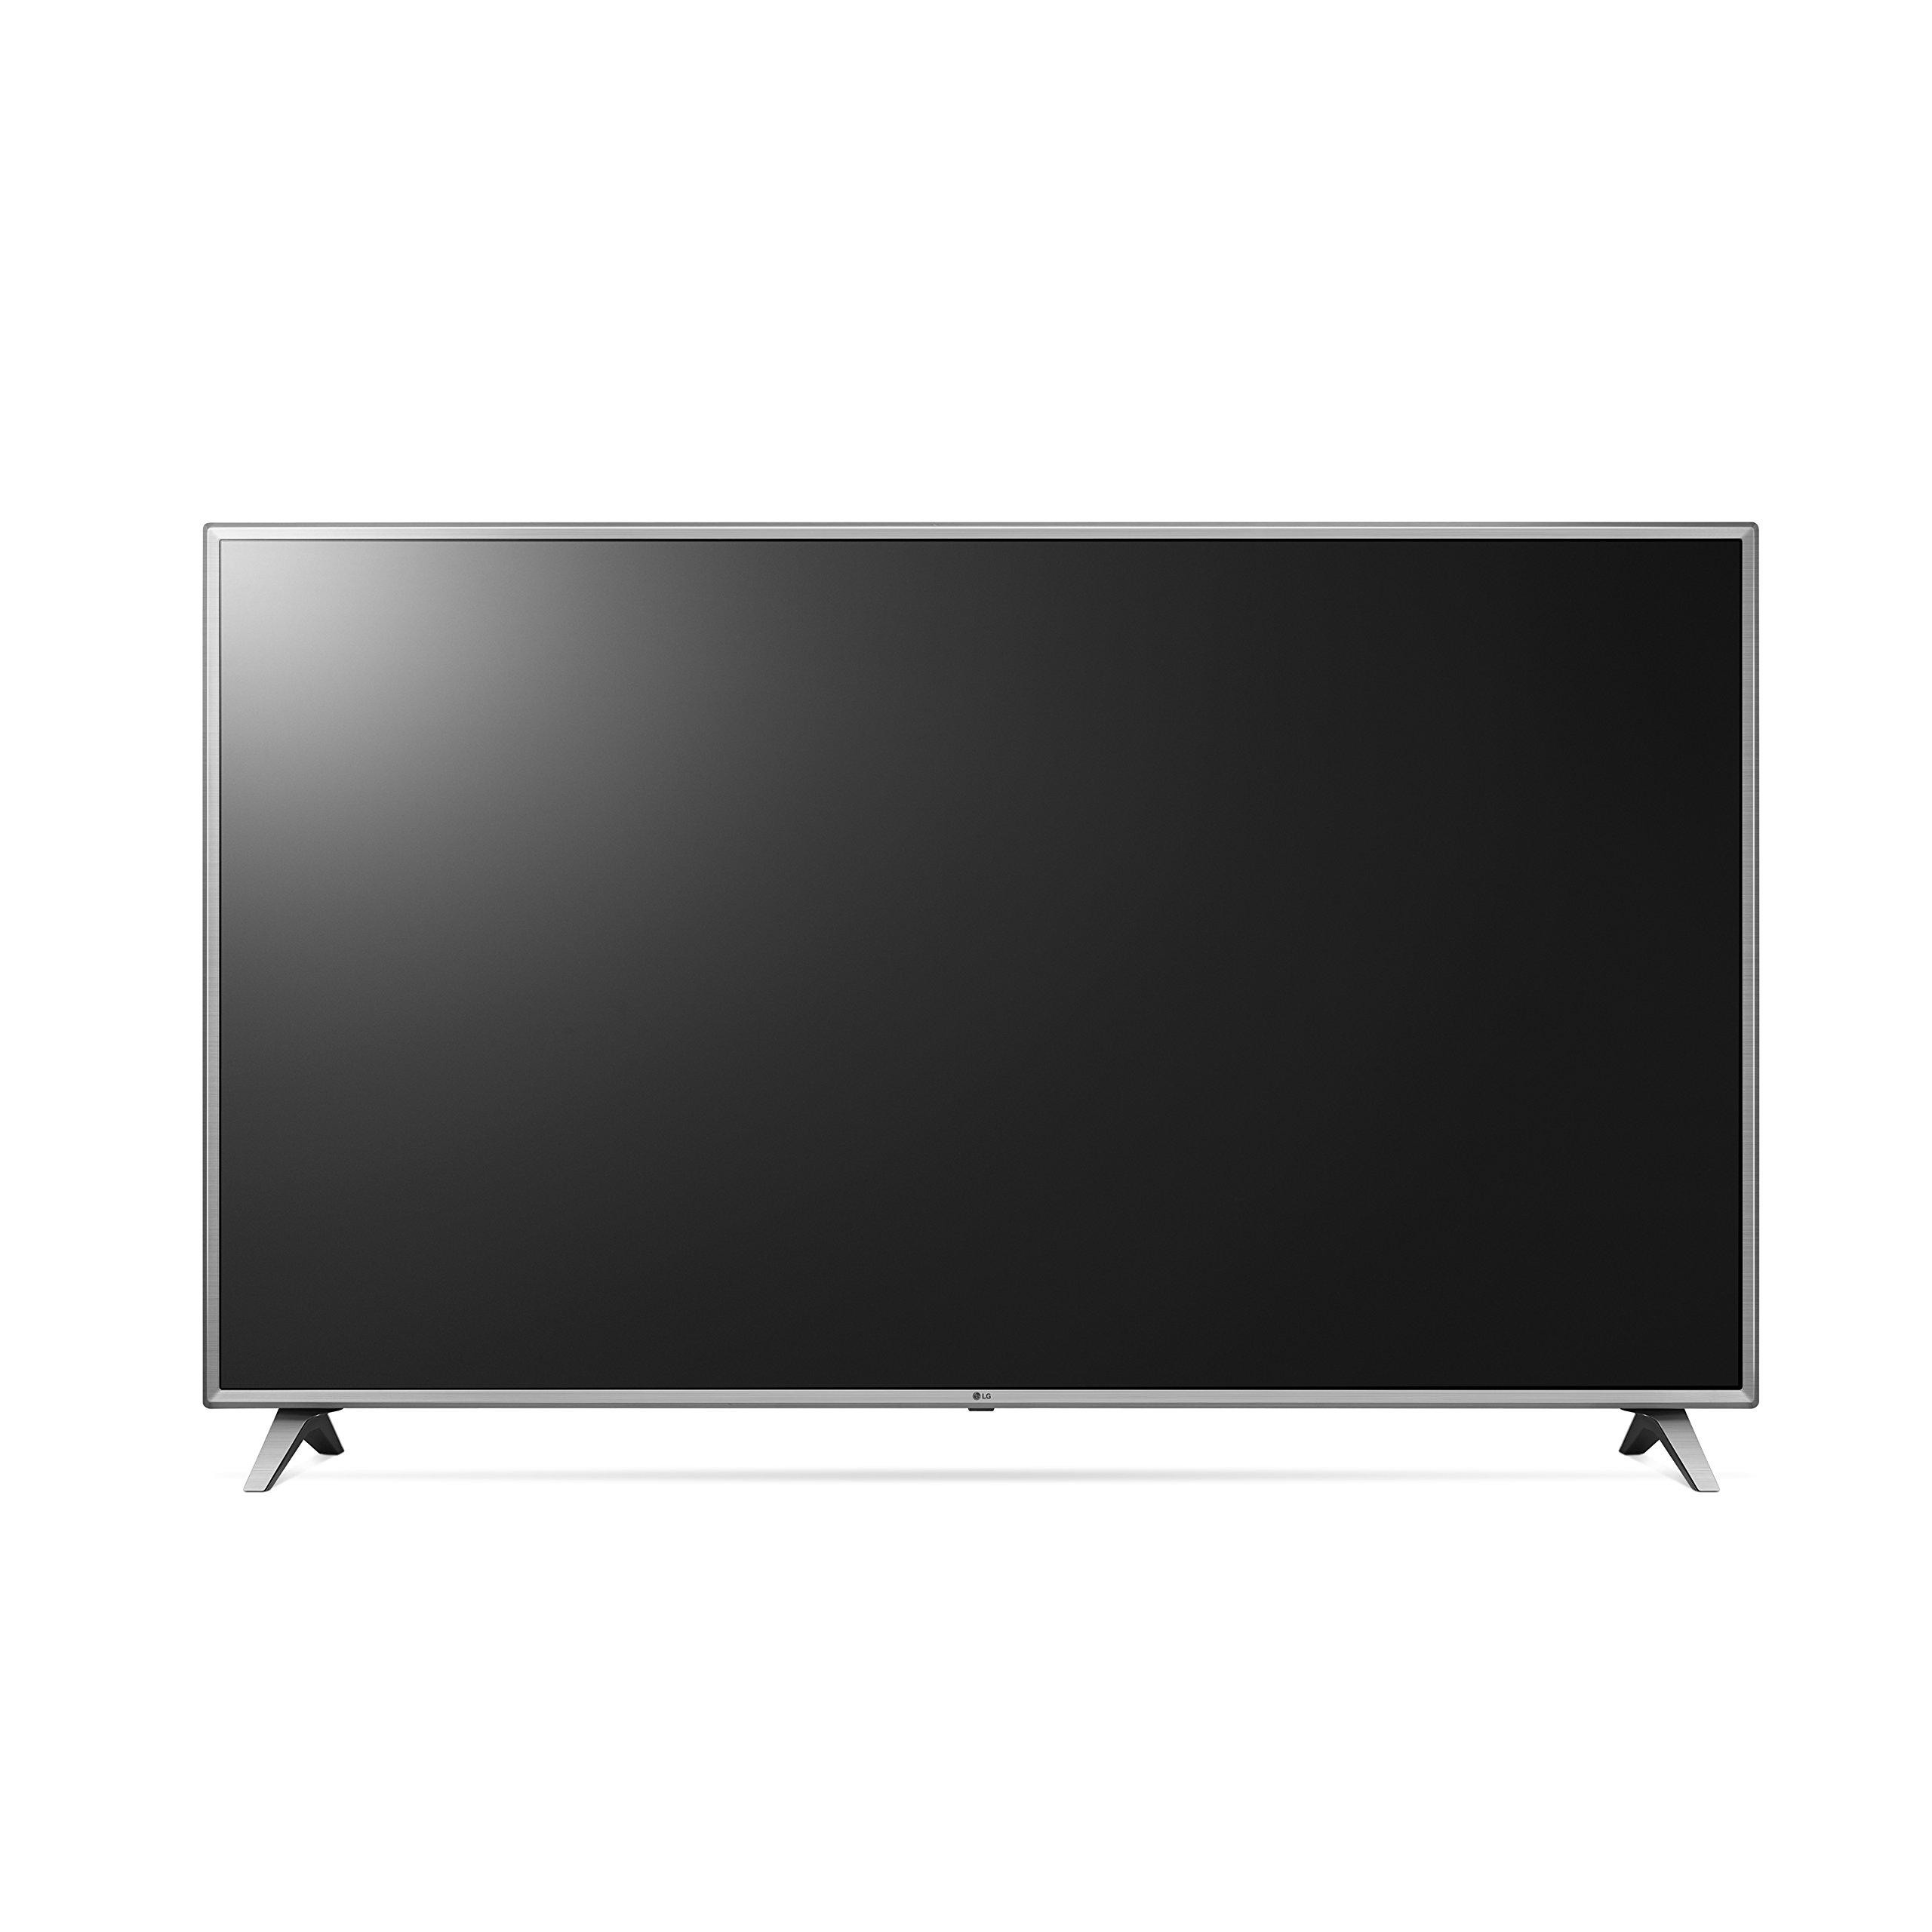 LG 50UK6500 LED TV 127 cm (50